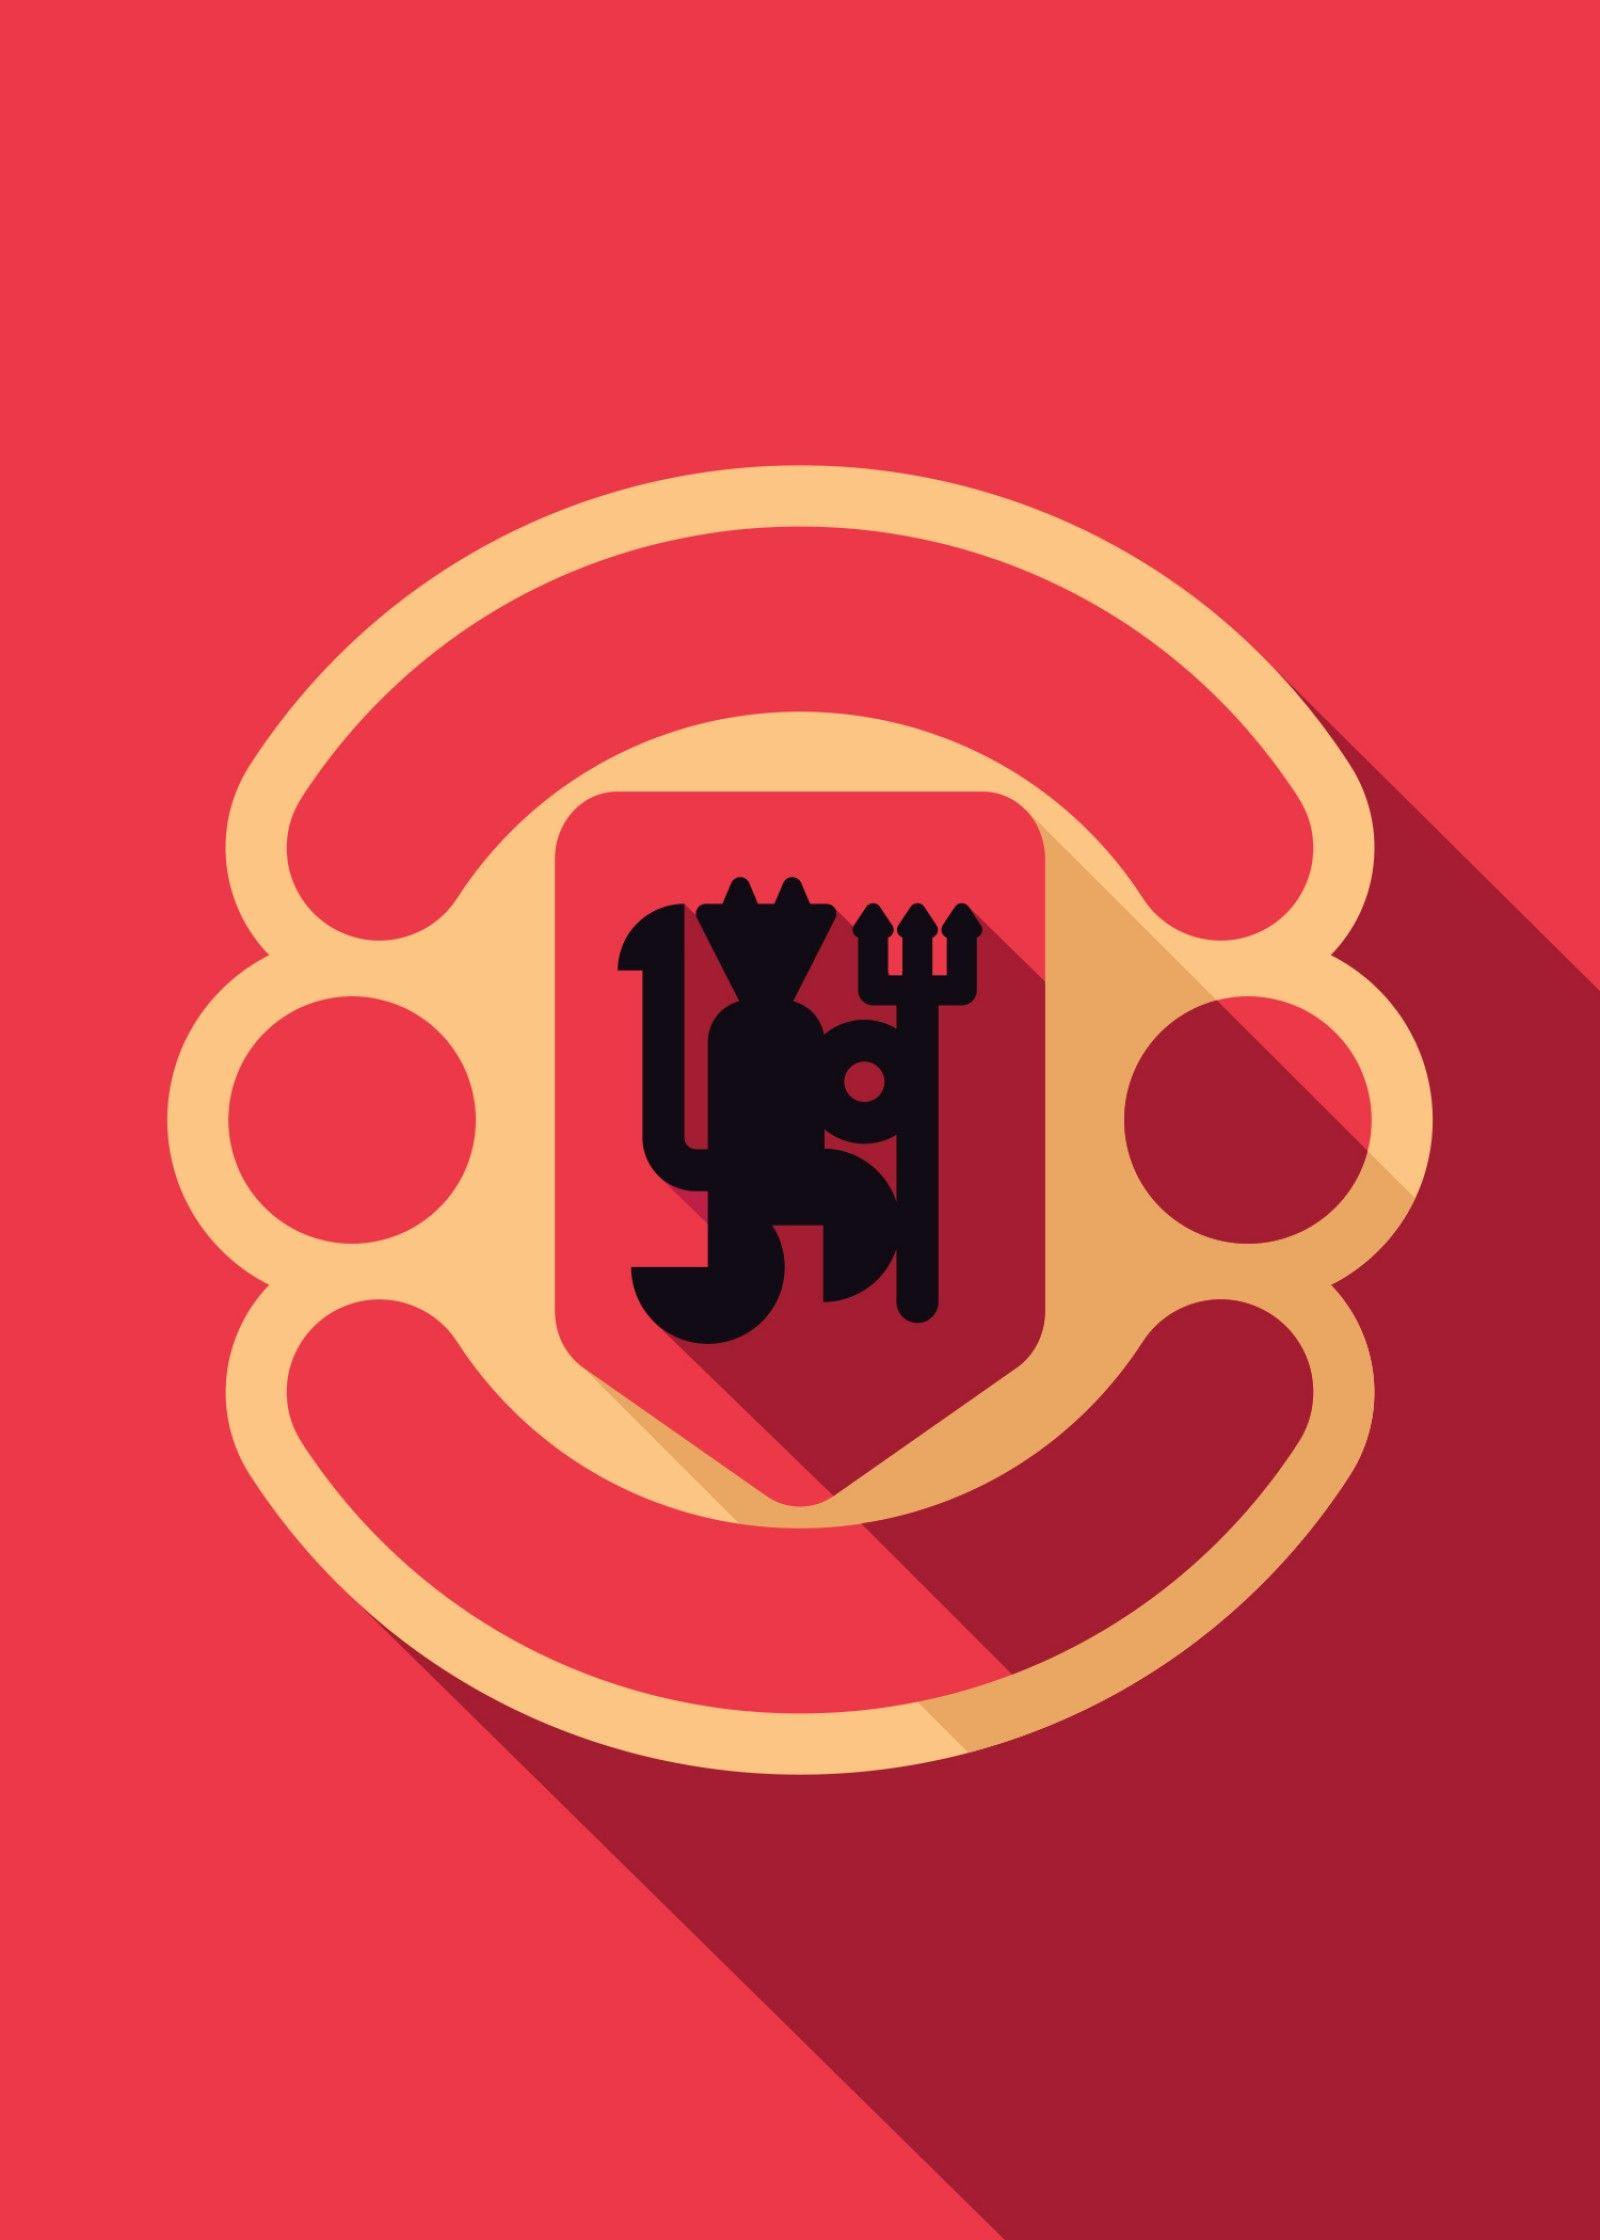 Minimalist Manchester United Futbol Artist Network Manchester United Legends Manchester United Art Manchester United